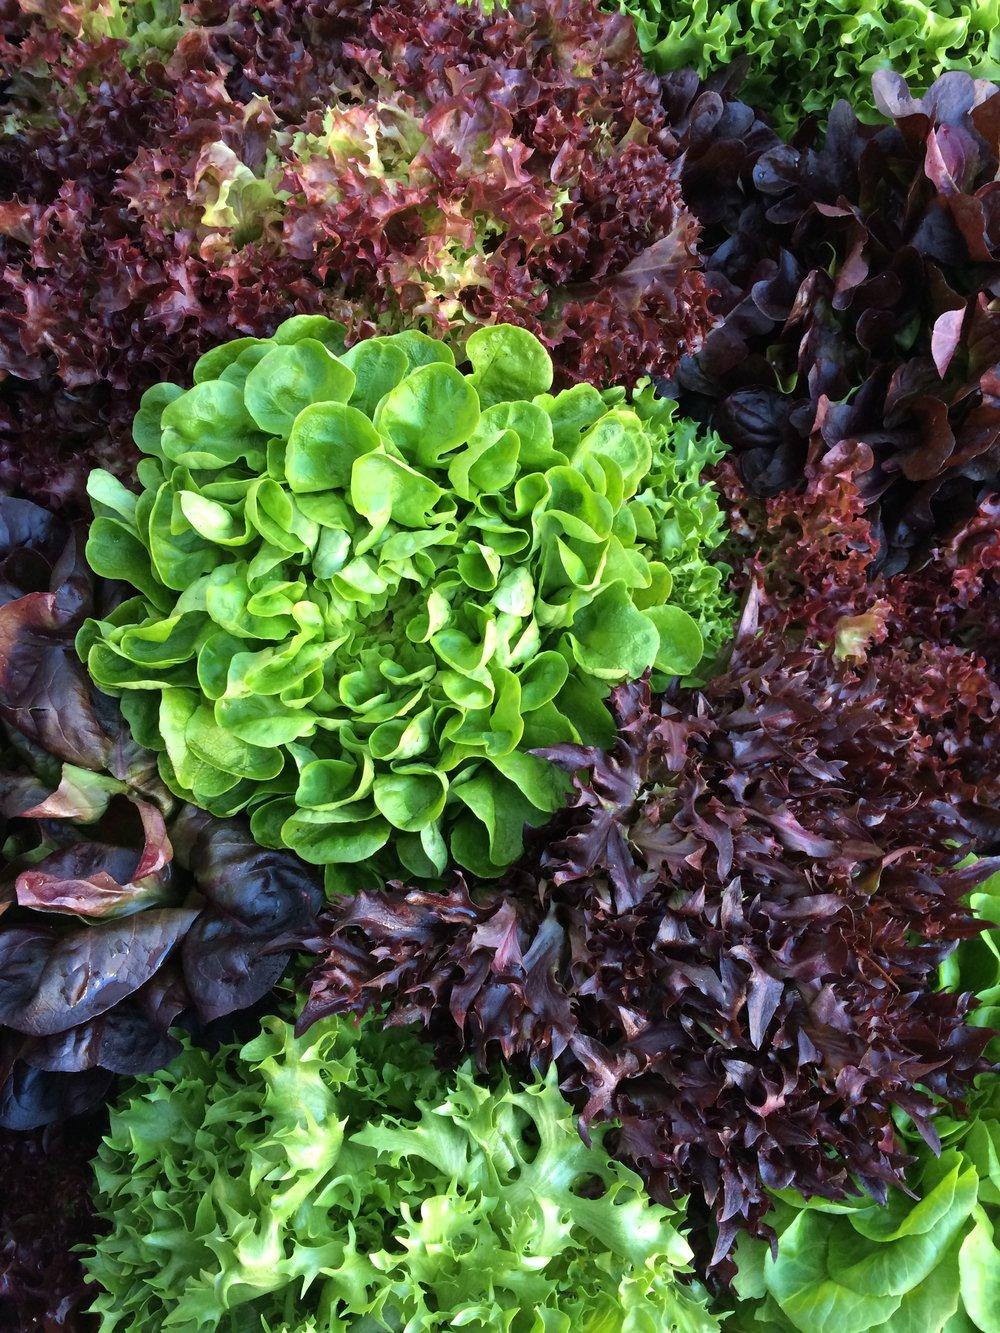 Salanova Lettuces